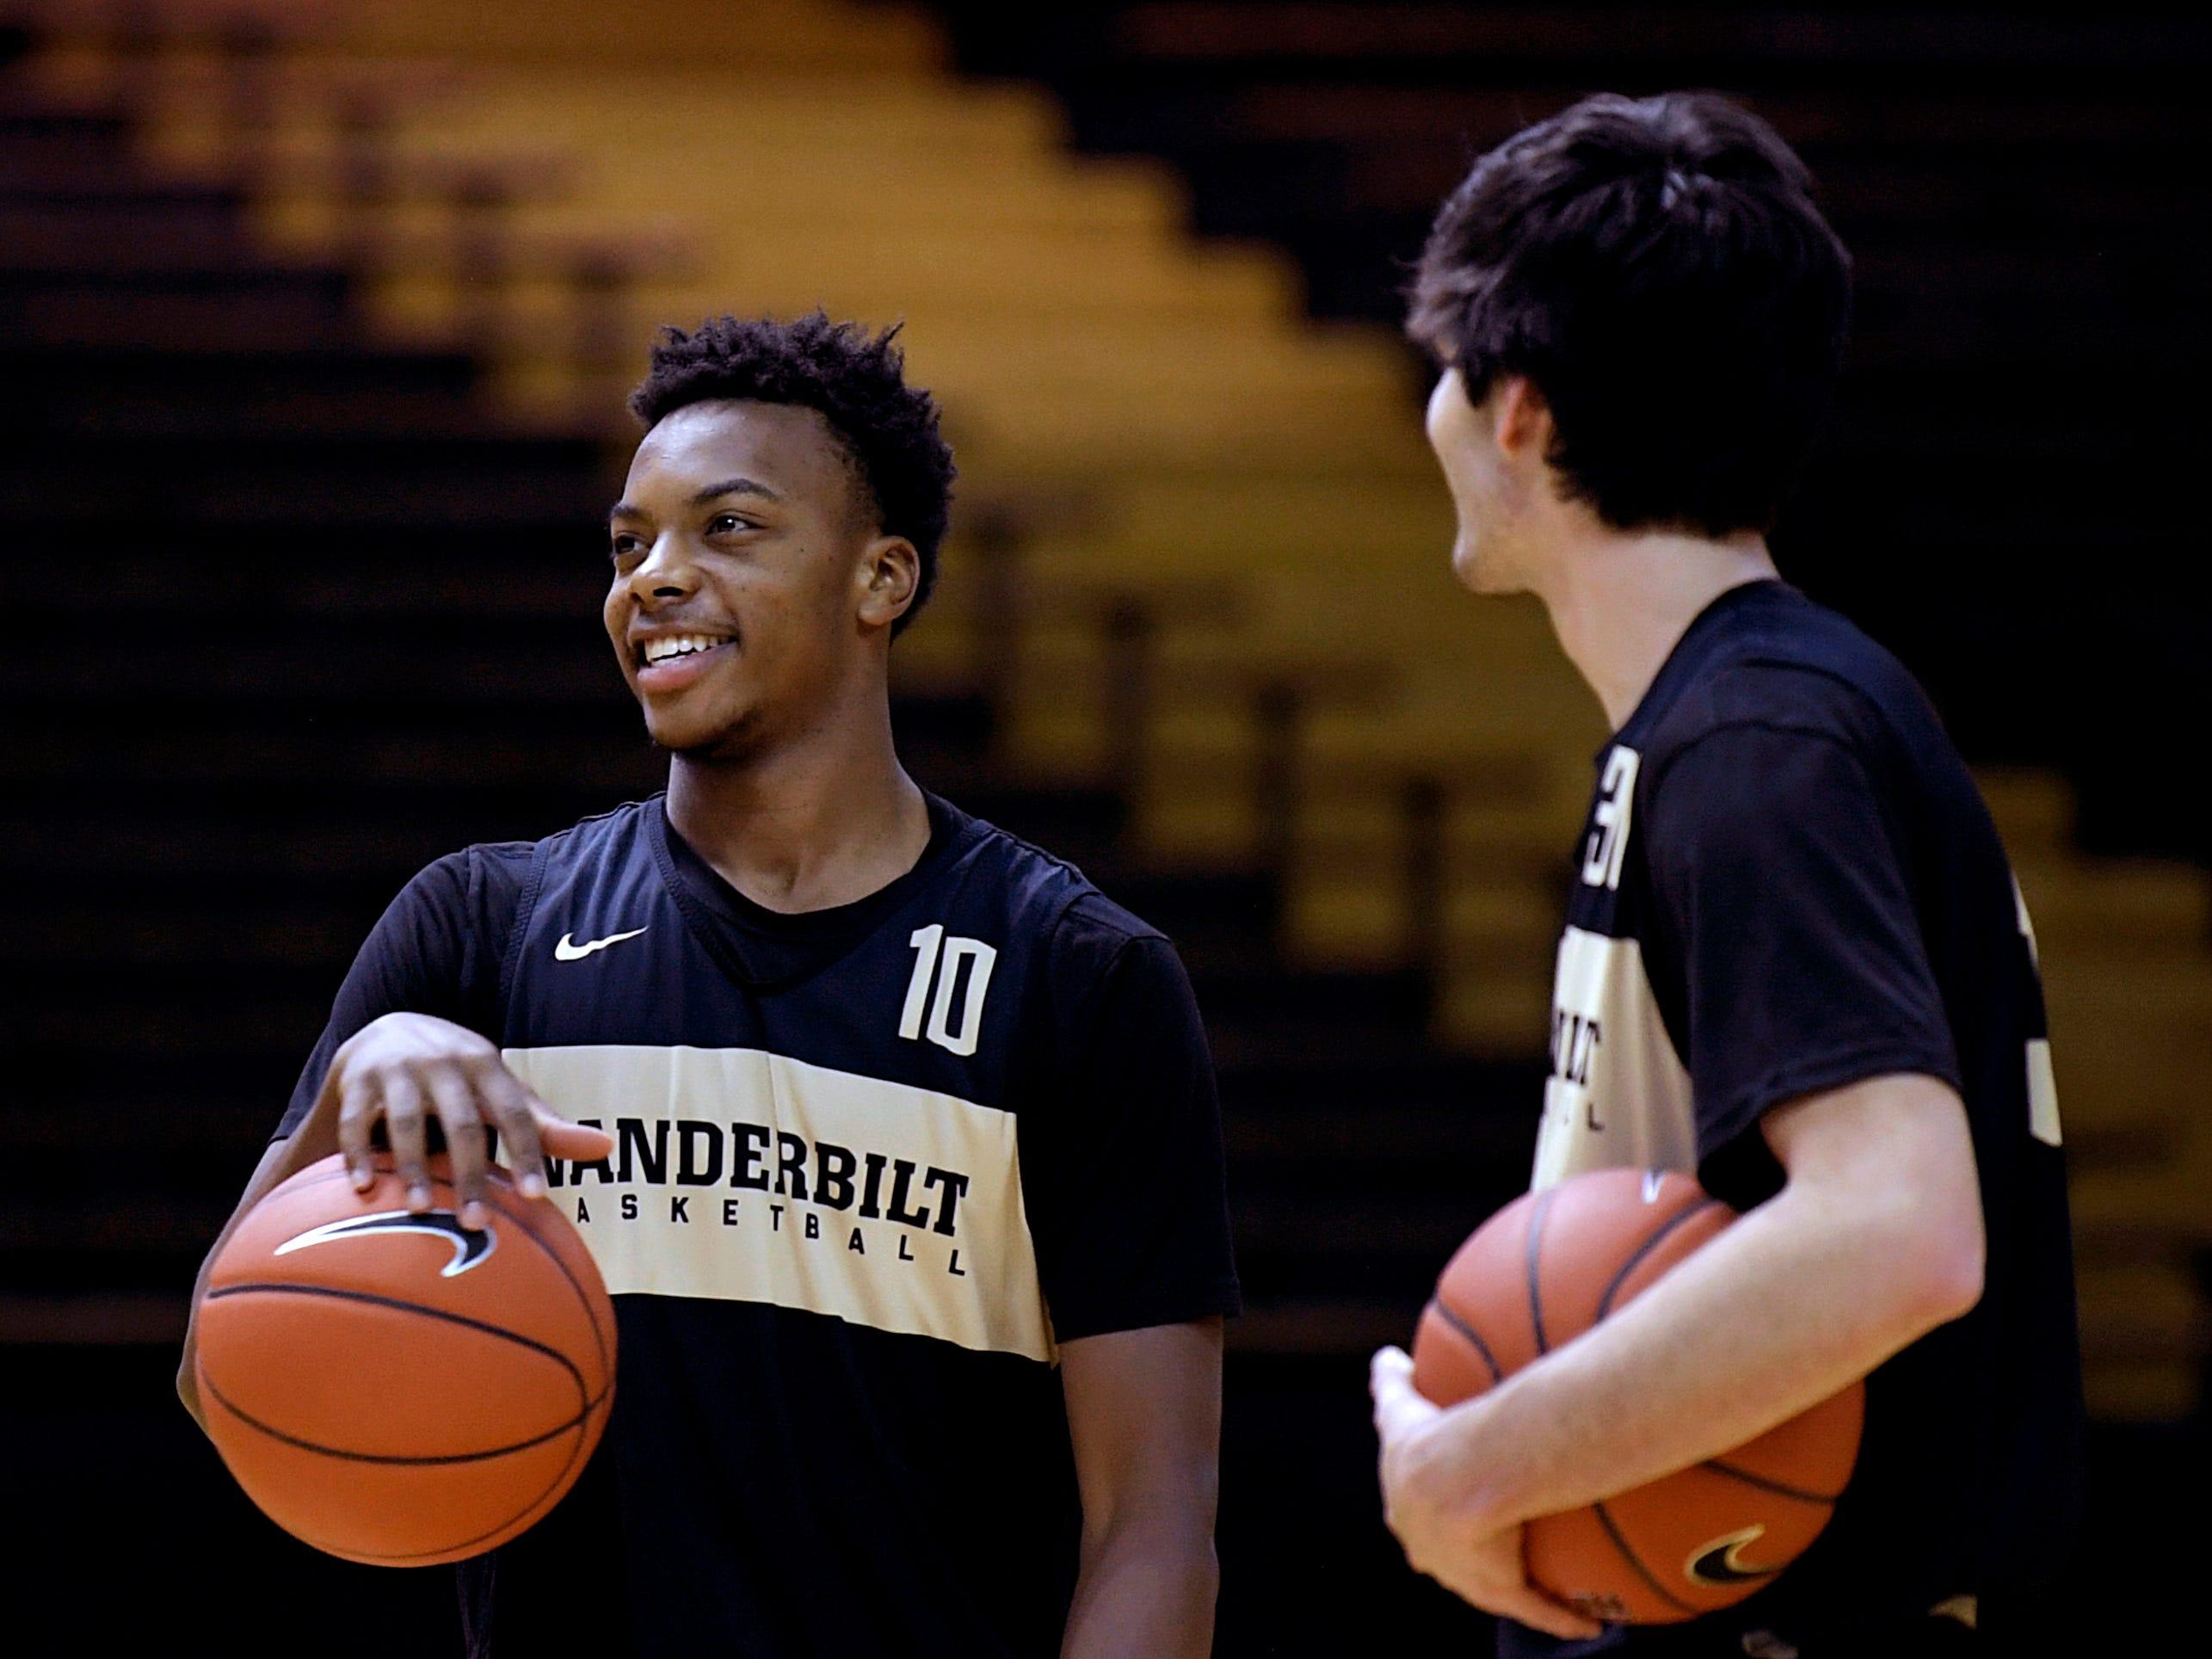 Vanderbilt basketball freshman players  Darius Garland and Mac Hunt laugh during practice at Memorial Gym on Monday, OCt. 22, 2018.